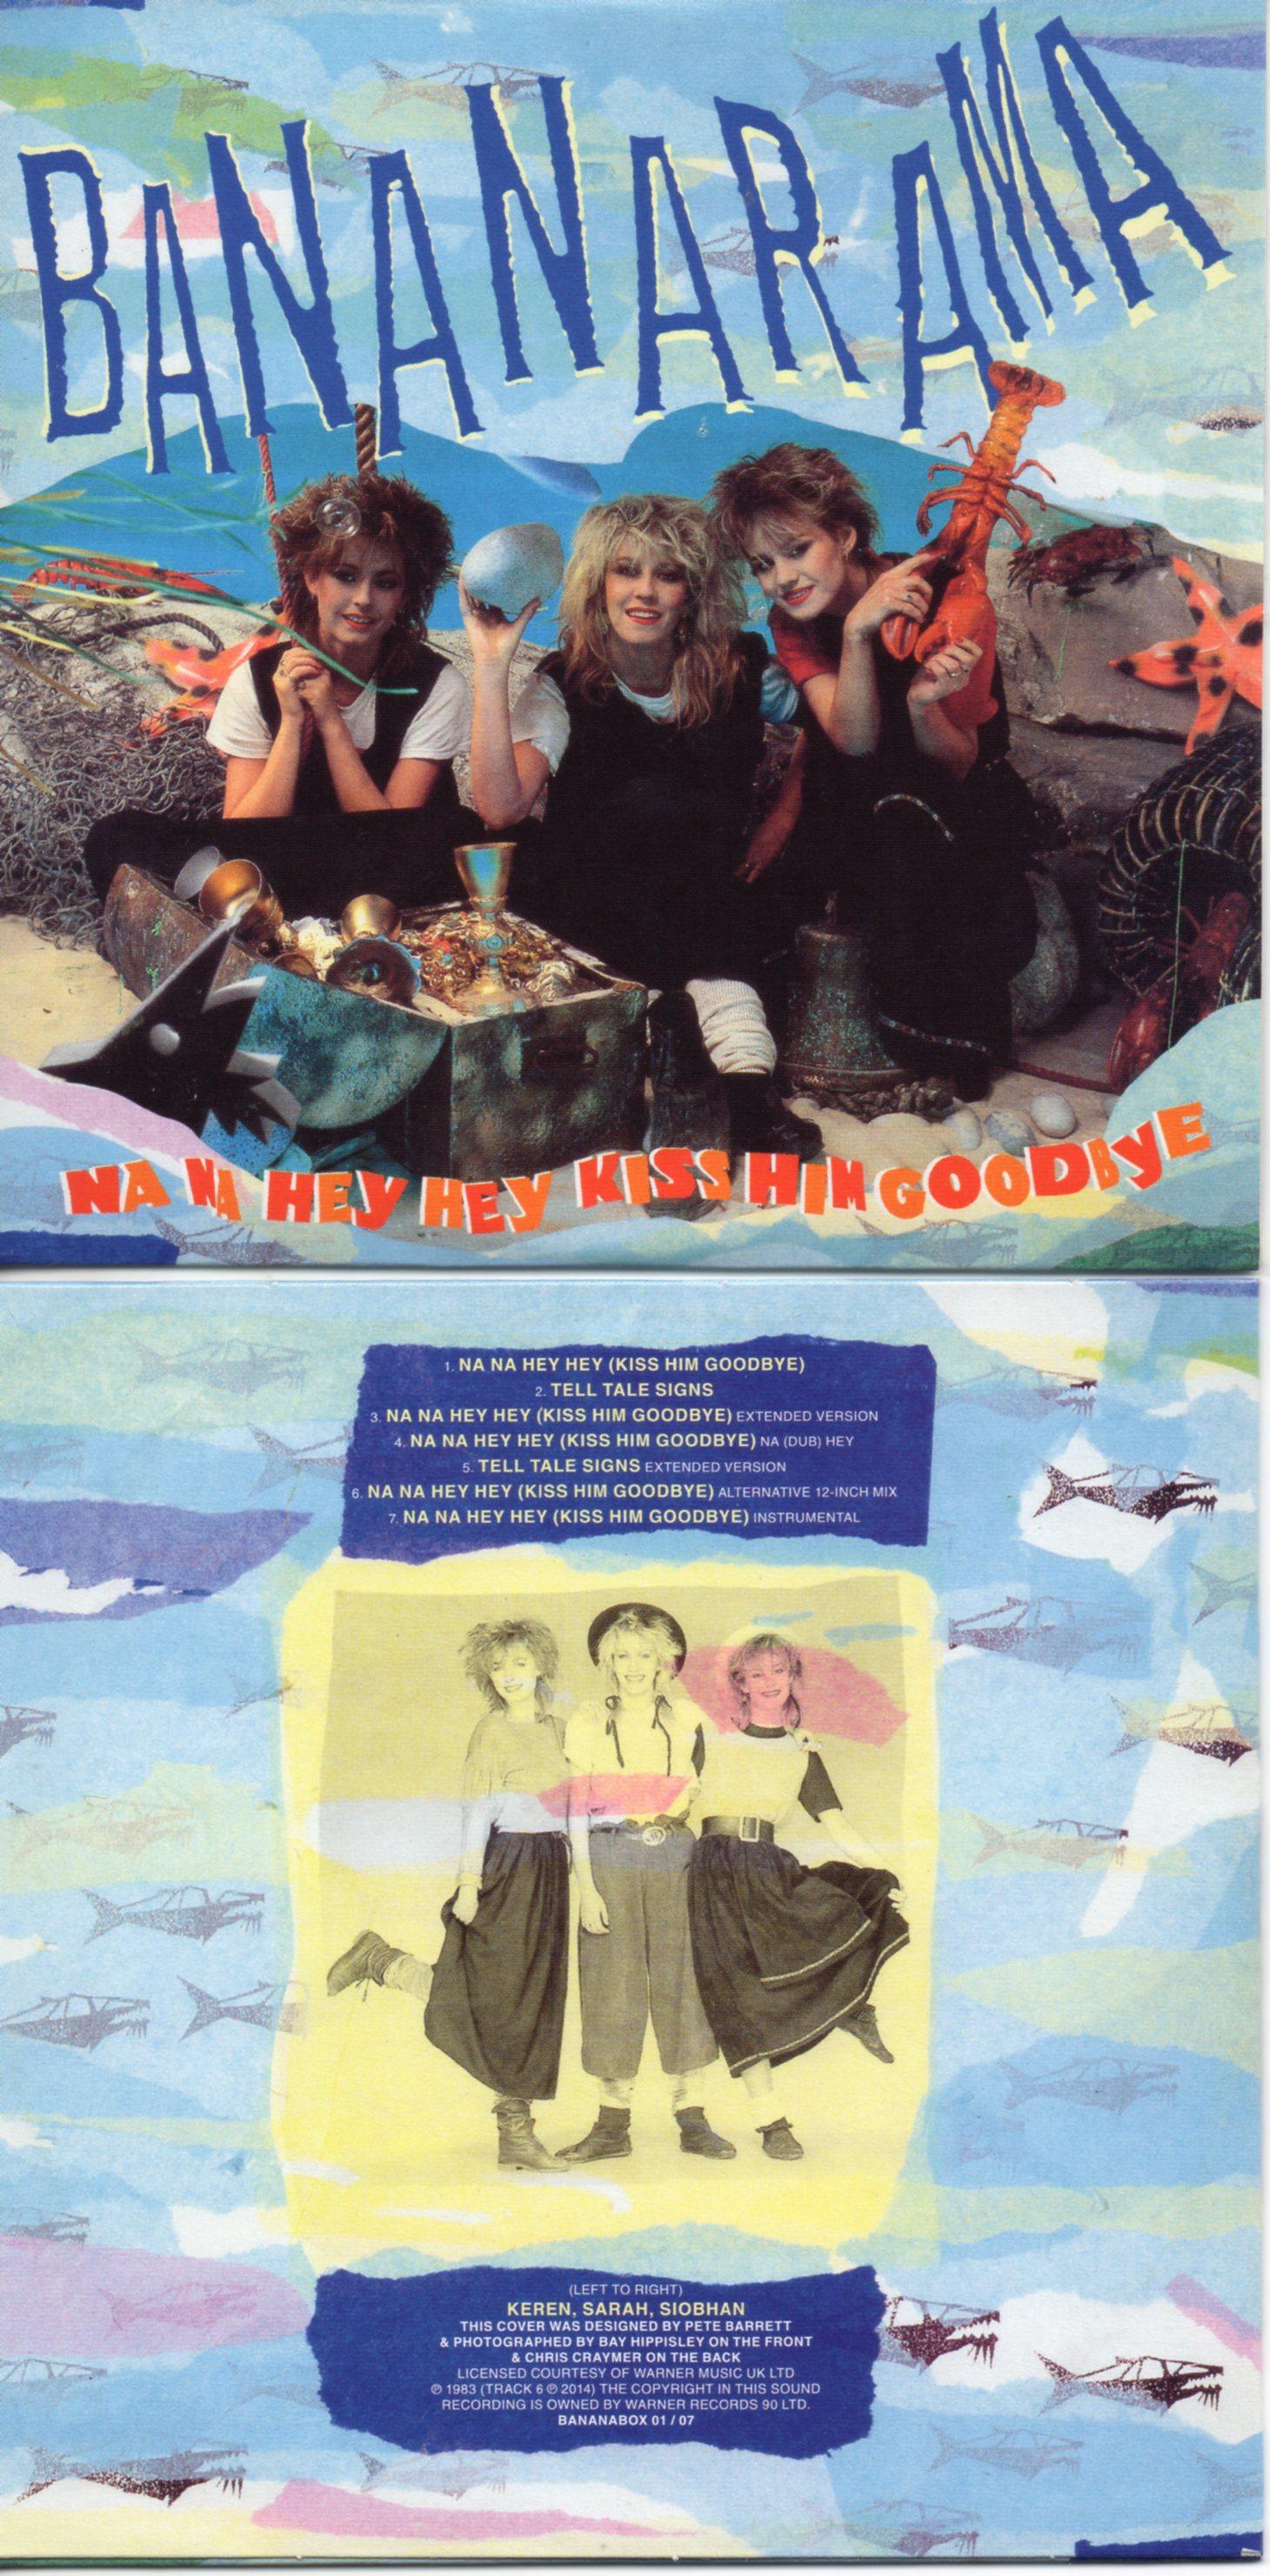 BANANARAMA - NA NA HEY HEY HEY (KISS HIM GOODBYE) (1983) 7-TRACK CARD SLEEVE - CD single